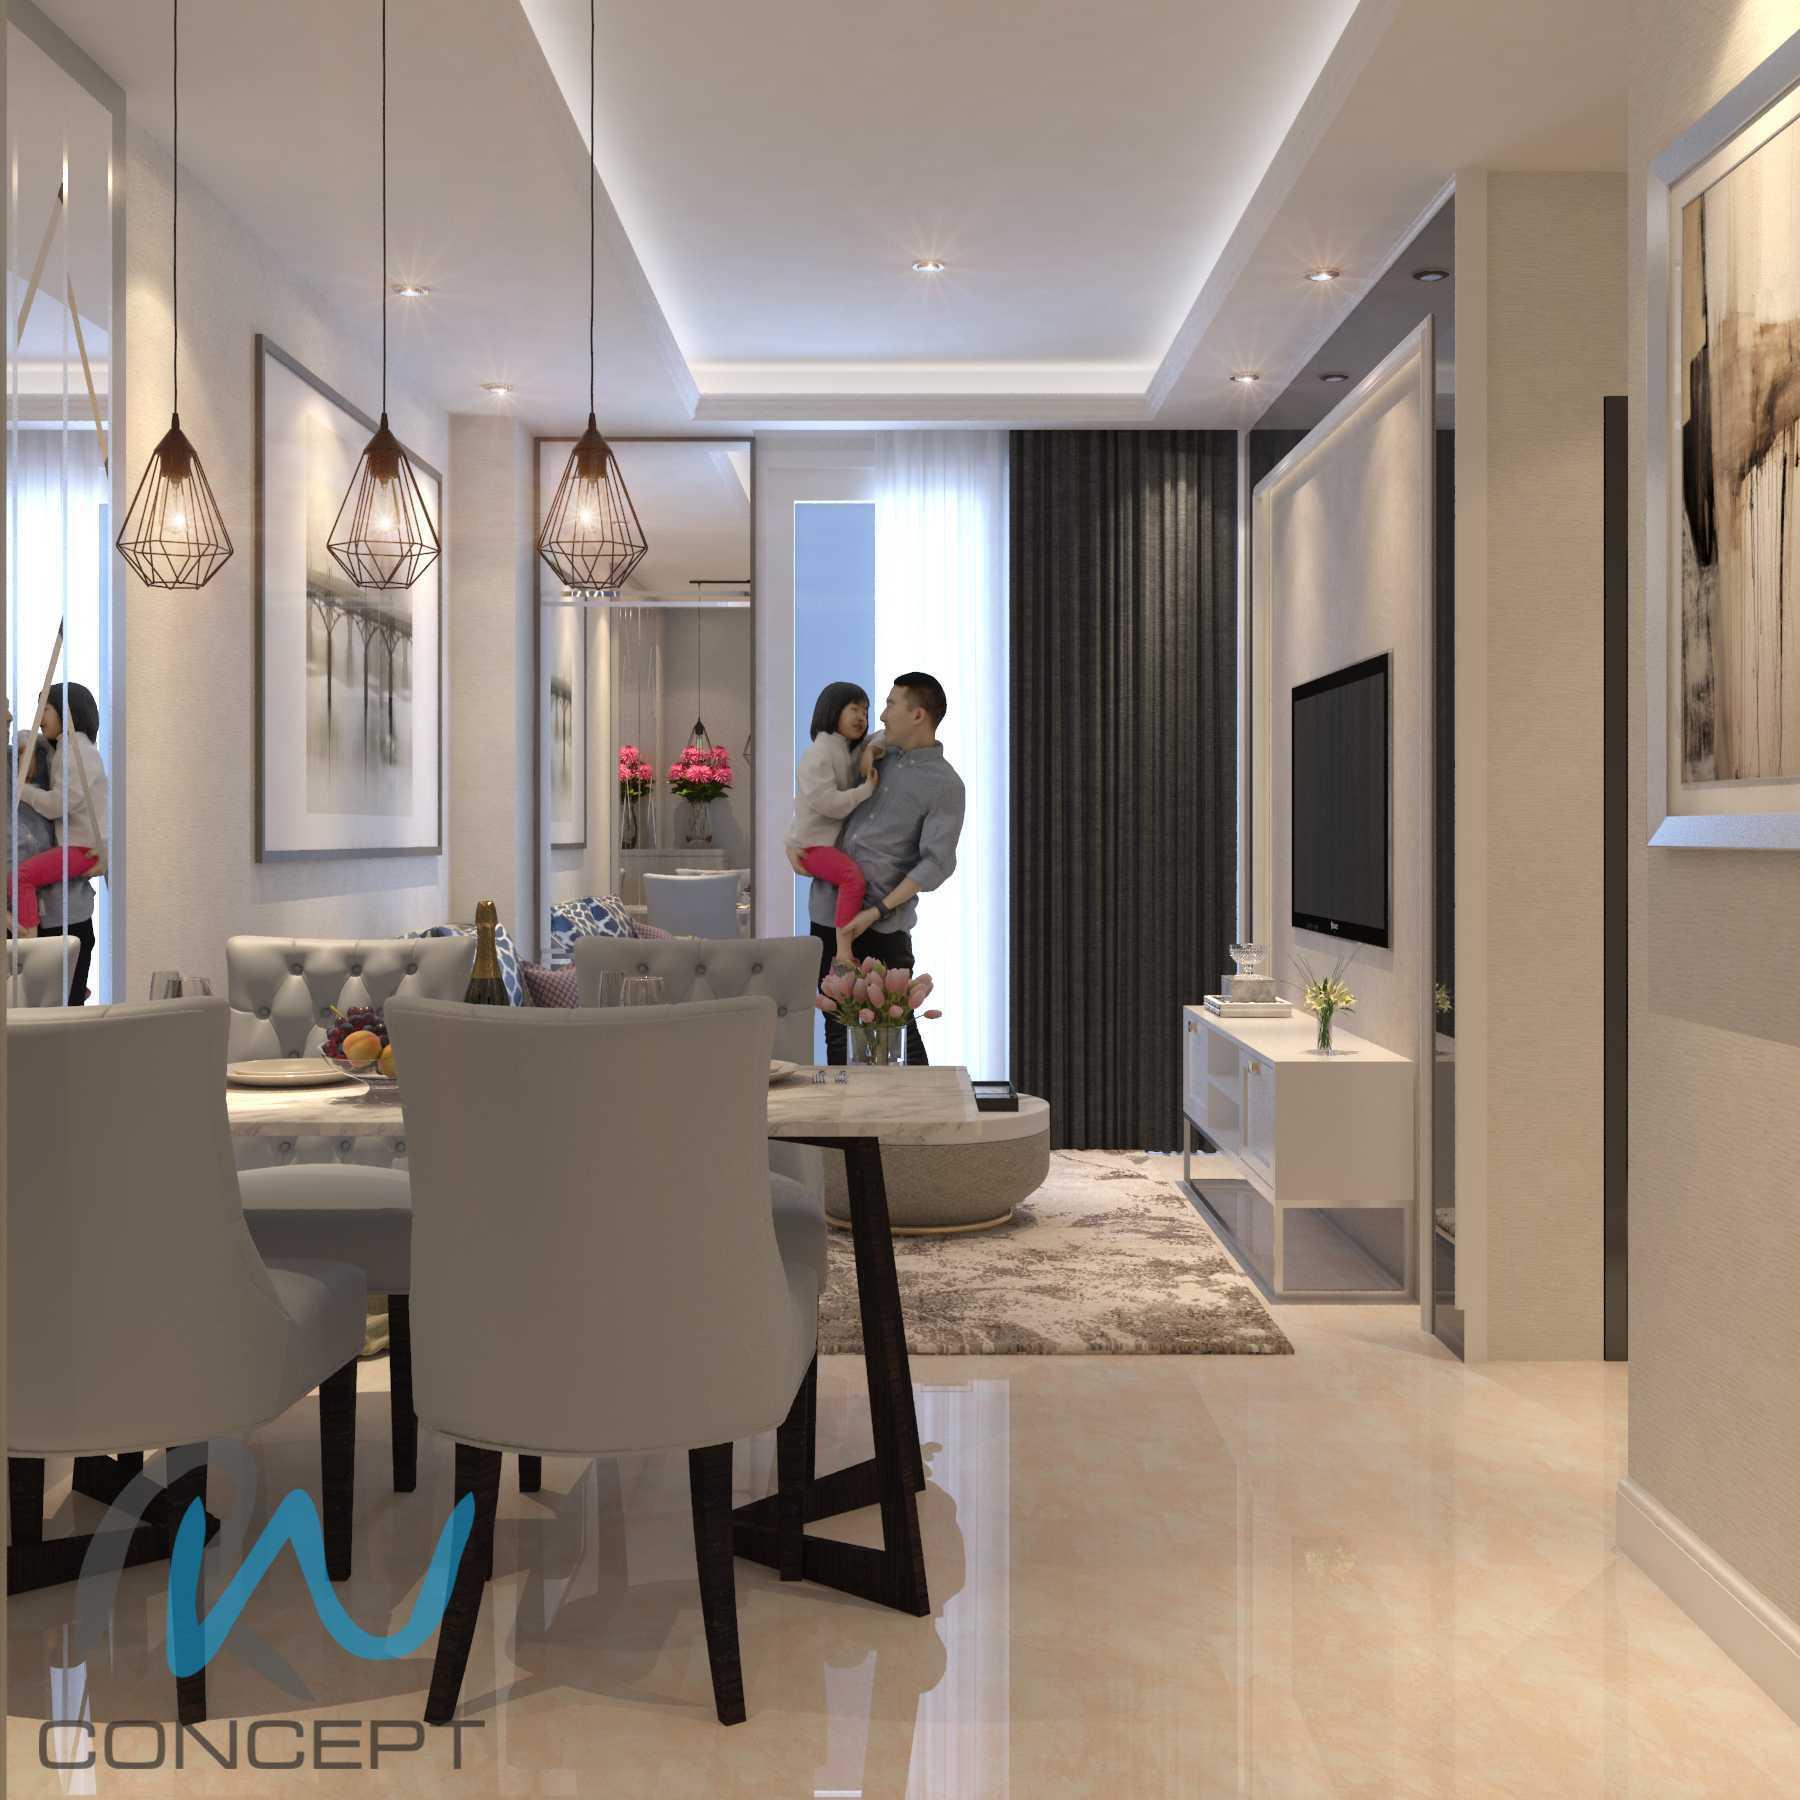 Interiaku Casa Grande Residence - Living Room Jakarta, Daerah Khusus Ibukota Jakarta, Indonesia Jakarta, Daerah Khusus Ibukota Jakarta, Indonesia Rw-Concept-Casa-Grande-Residence-Living-Room   61834